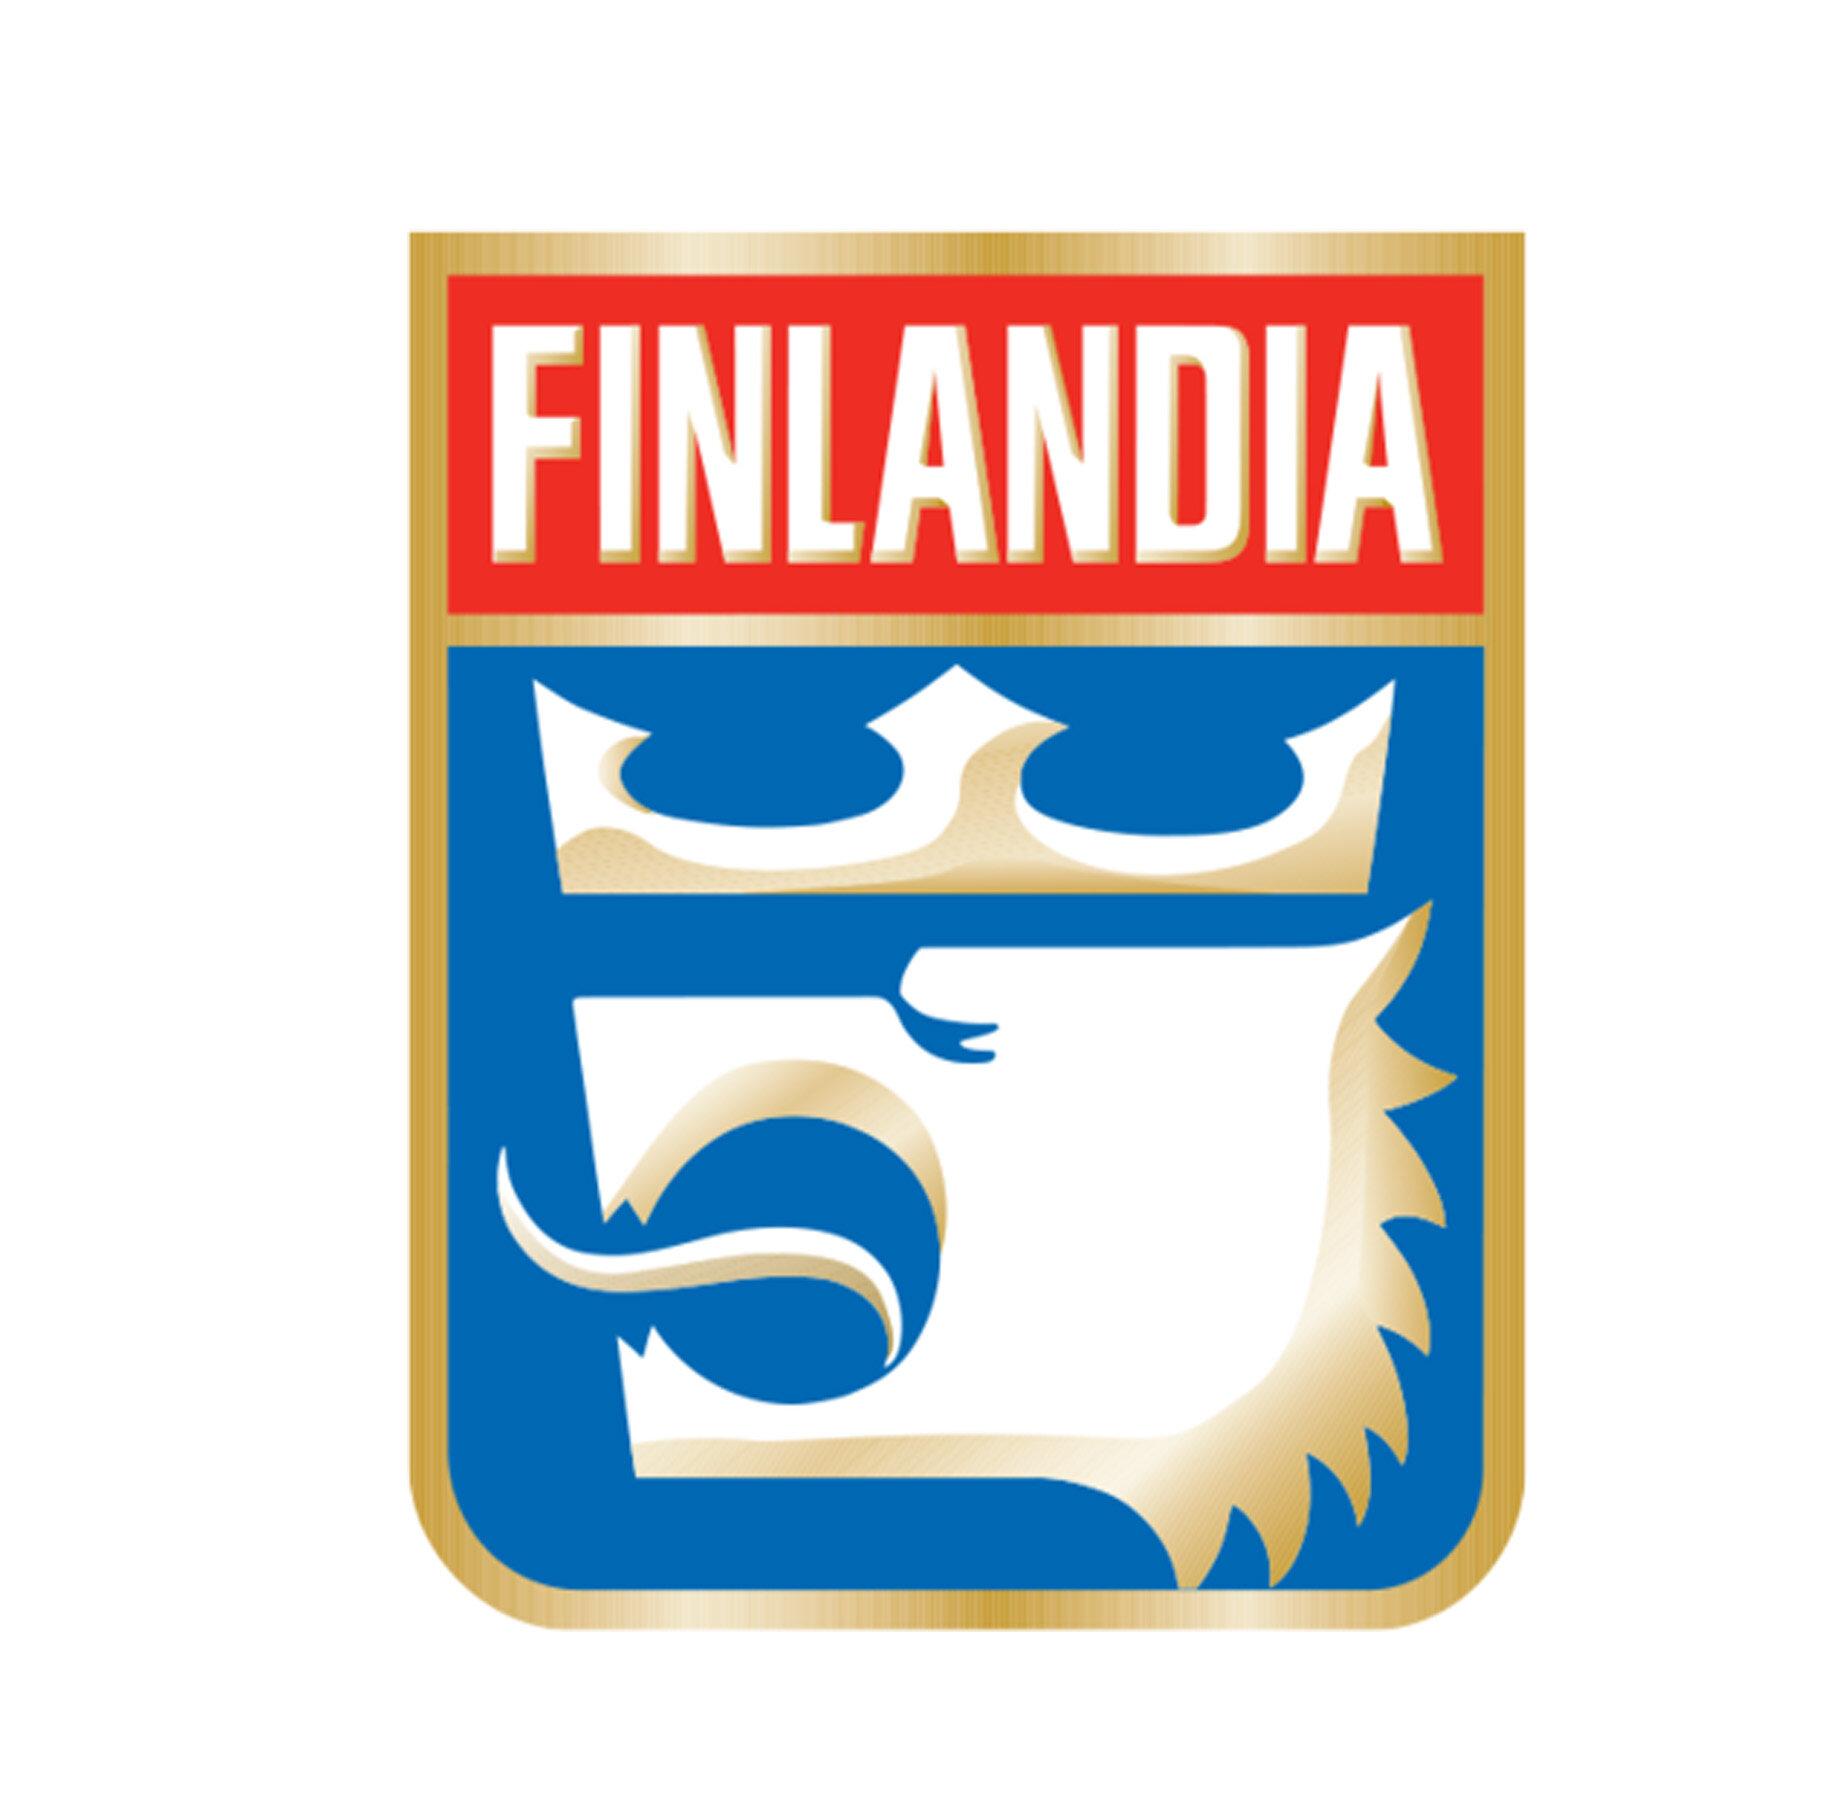 finlandia.jpg